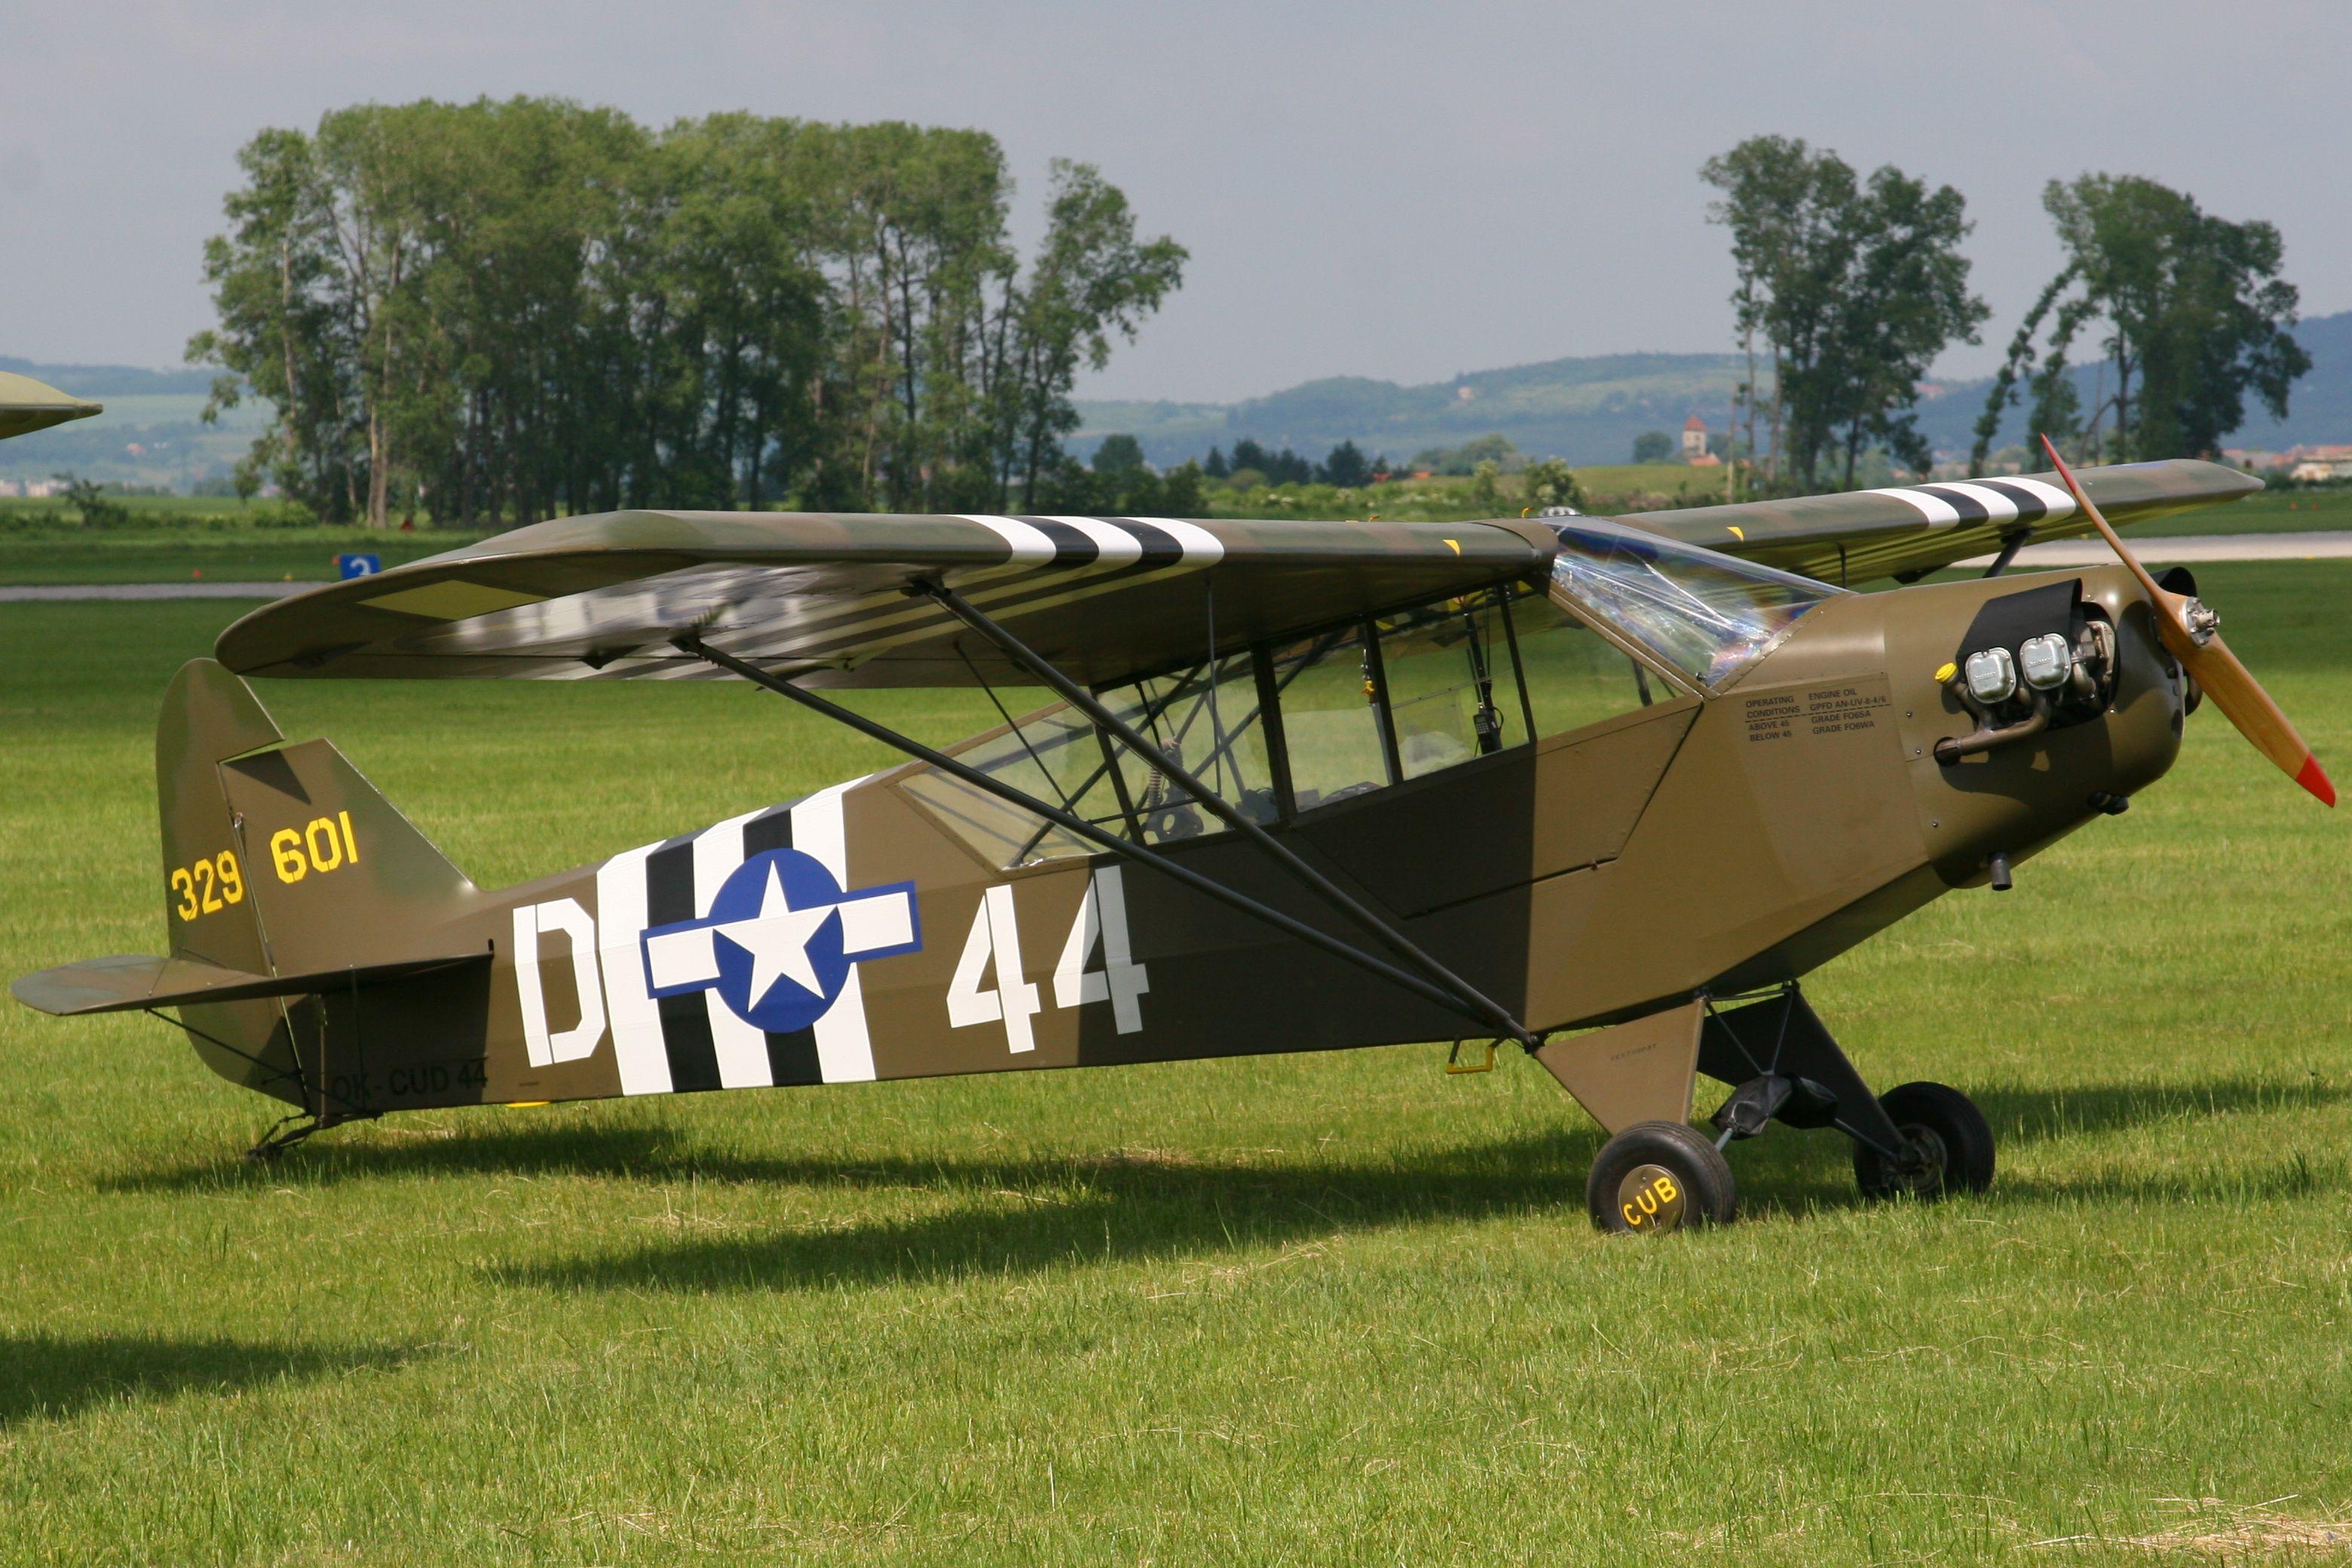 Piper Cub D-44 | airplanes | Piper aircraft, Aircraft, Airplane